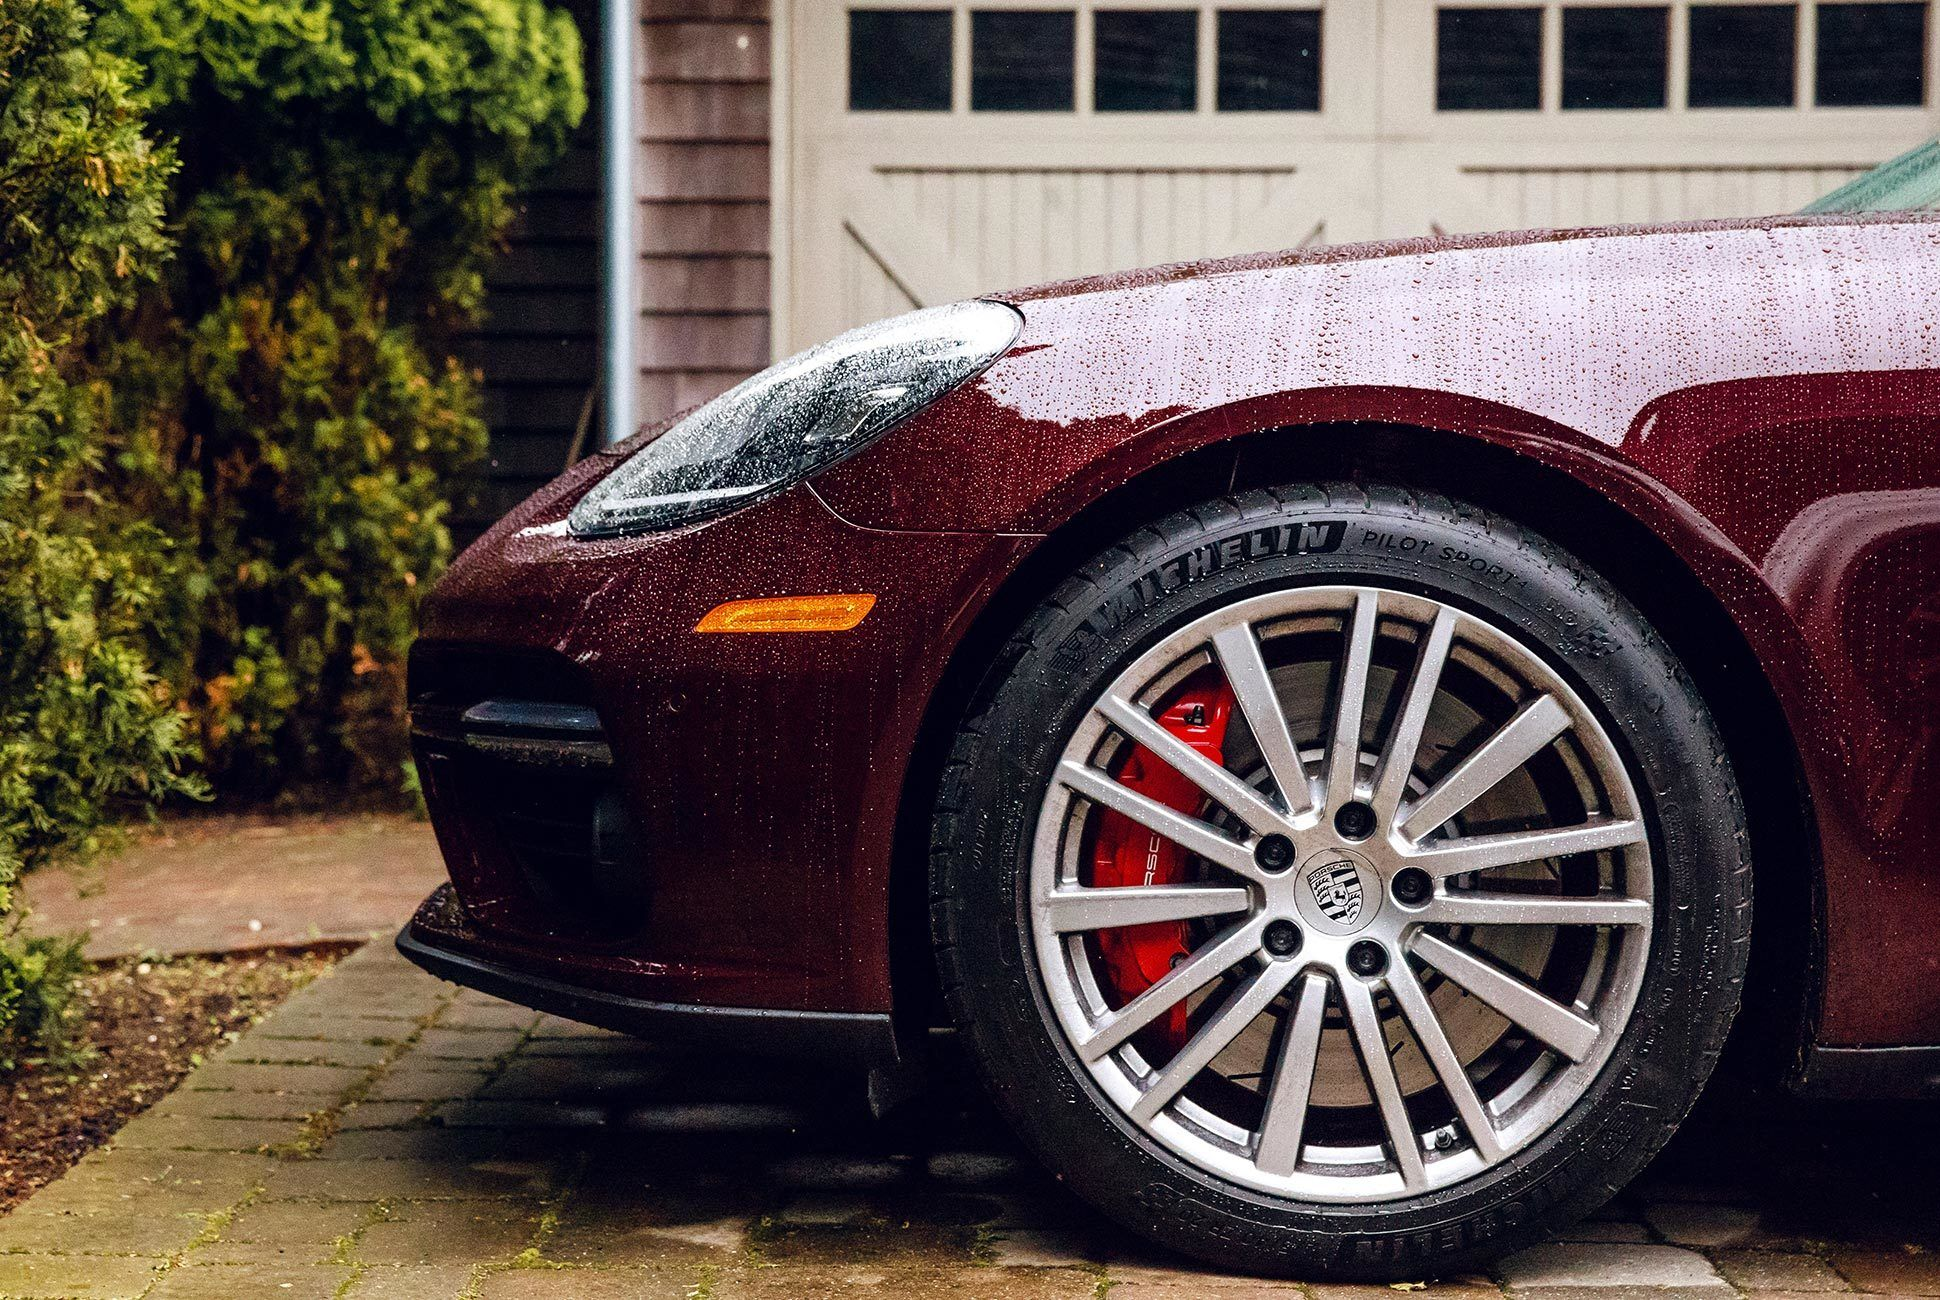 Porsche-Panamera-Turbo-Sport-Turismo-Review-gear-patrol-slide-15